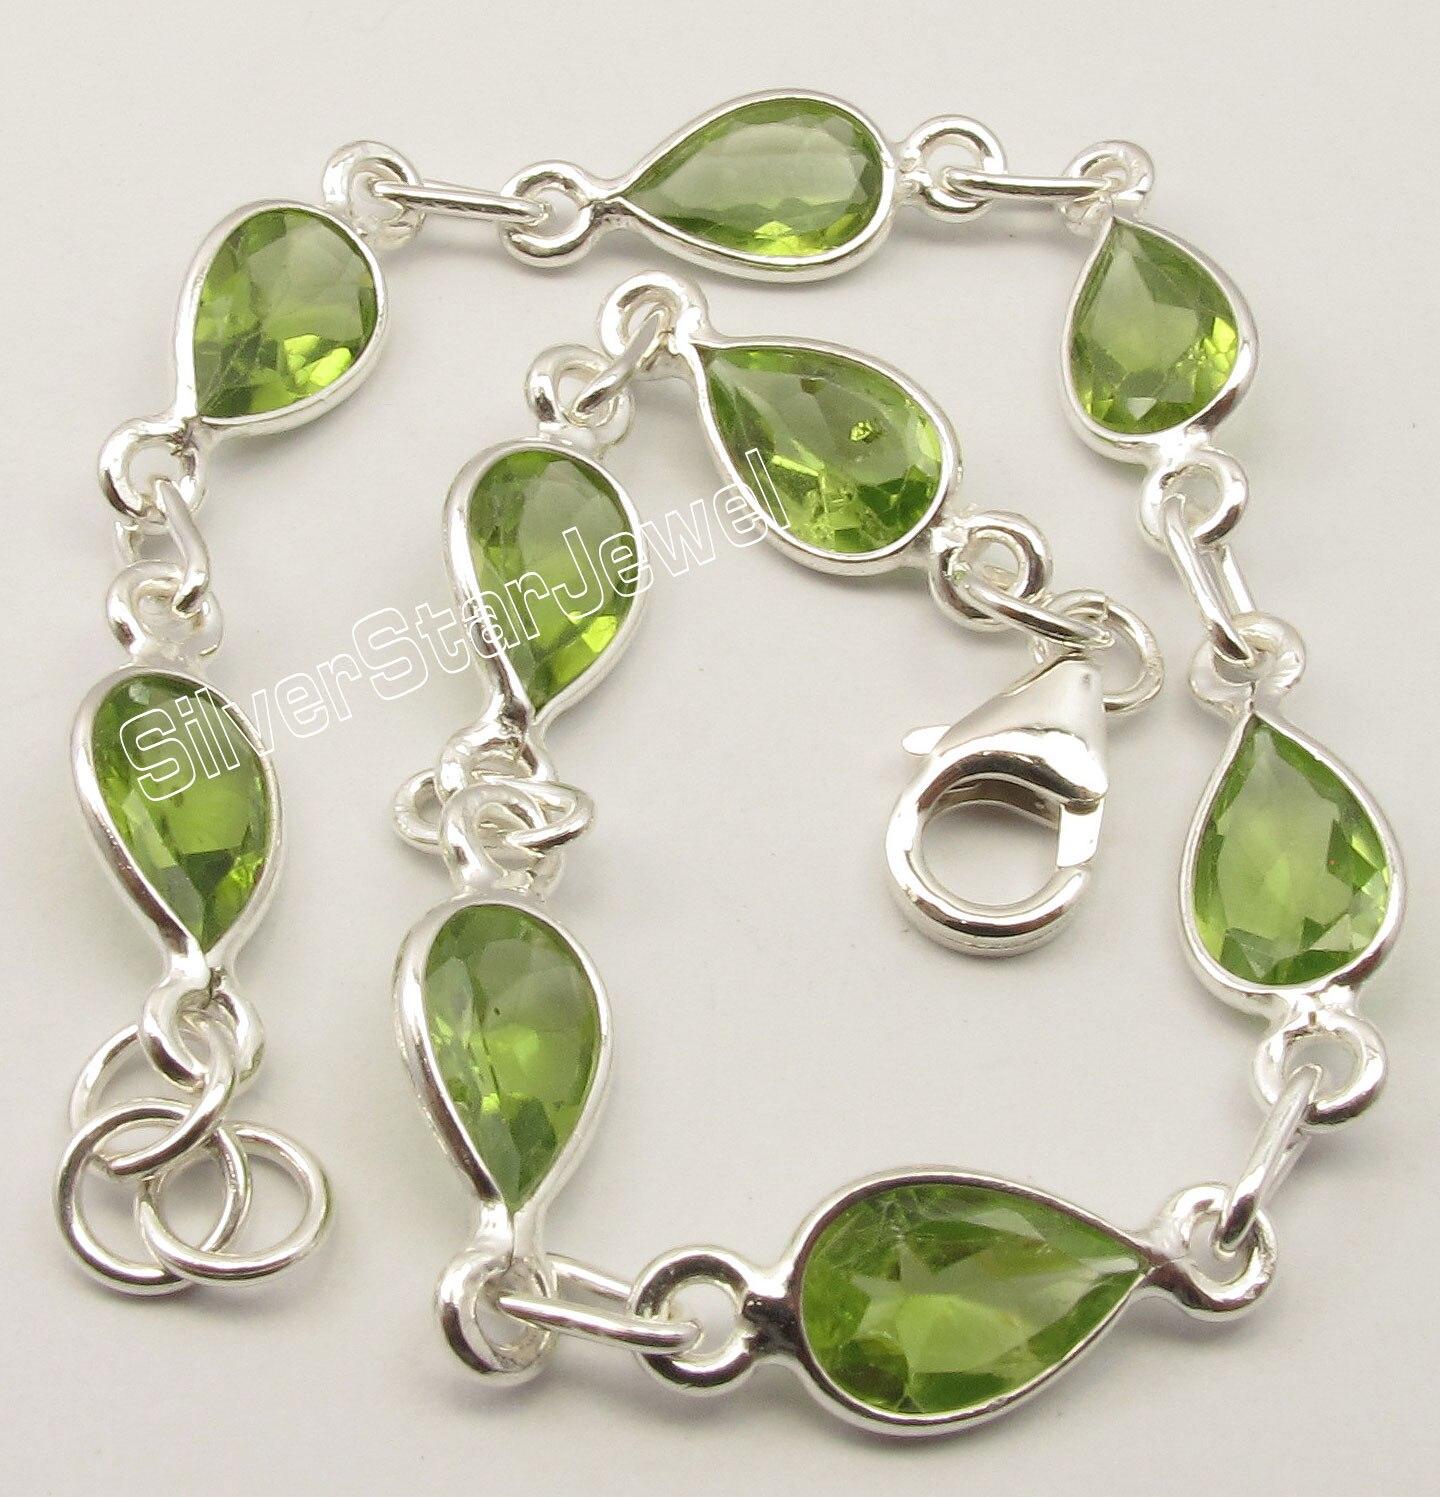 Chanti International Pure Silver GREEN CUT PERIDOT MODERNISTIC New Bracelet 21.2 CM JEWELRY STORE